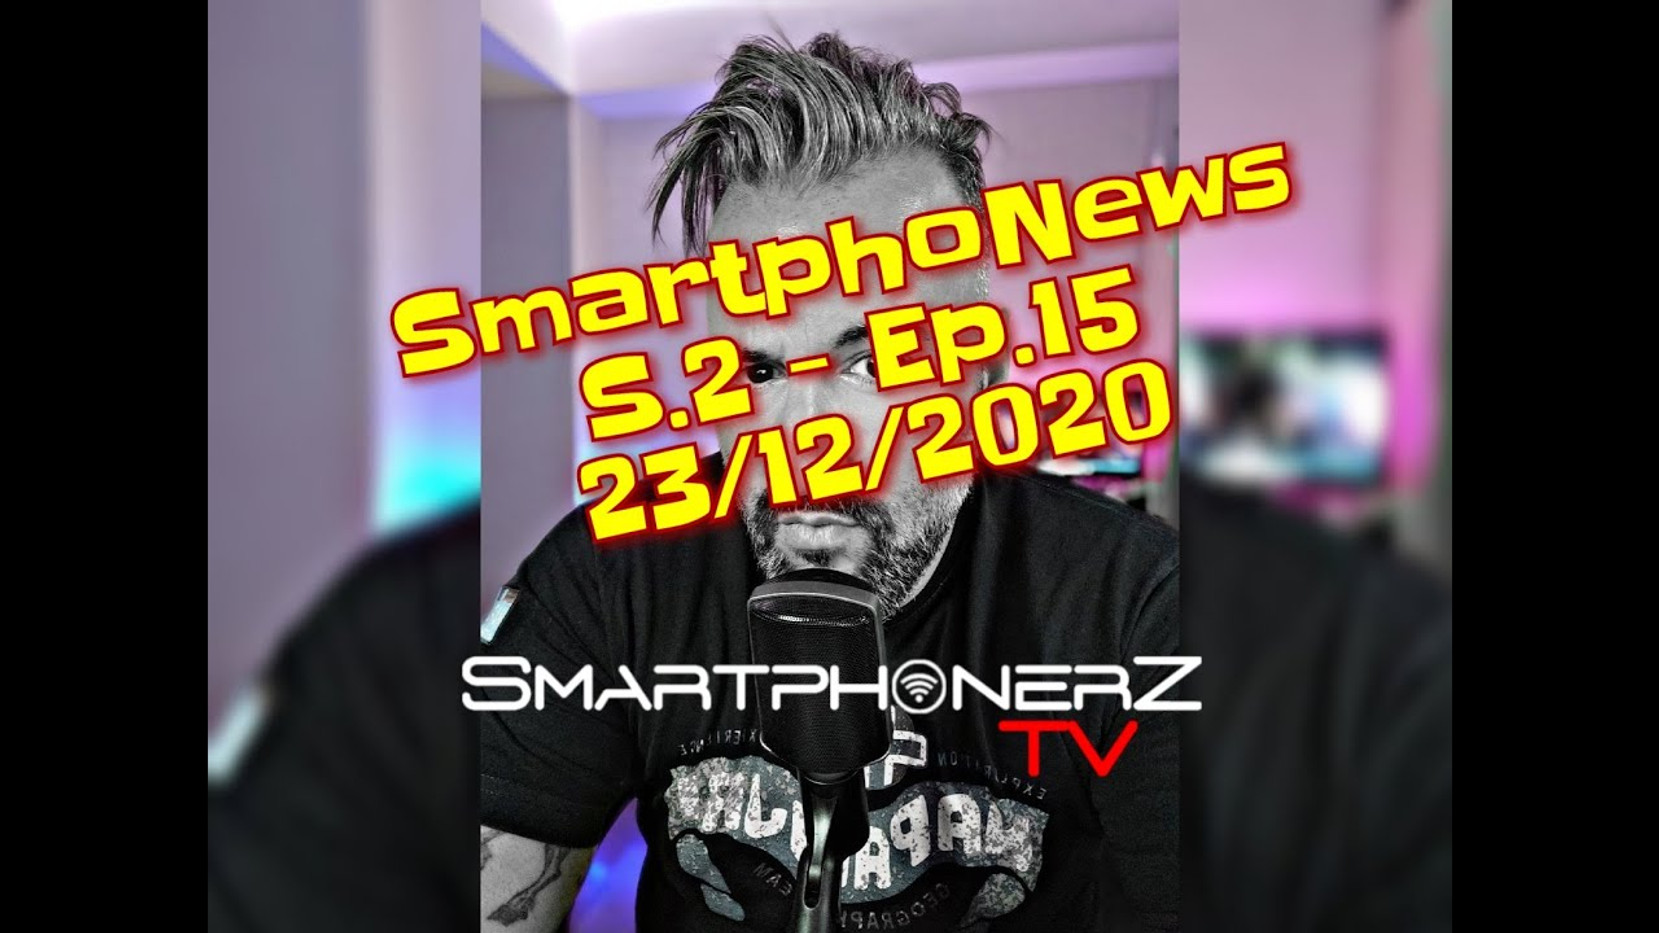 SmartphoNews S.2 - Ep.15